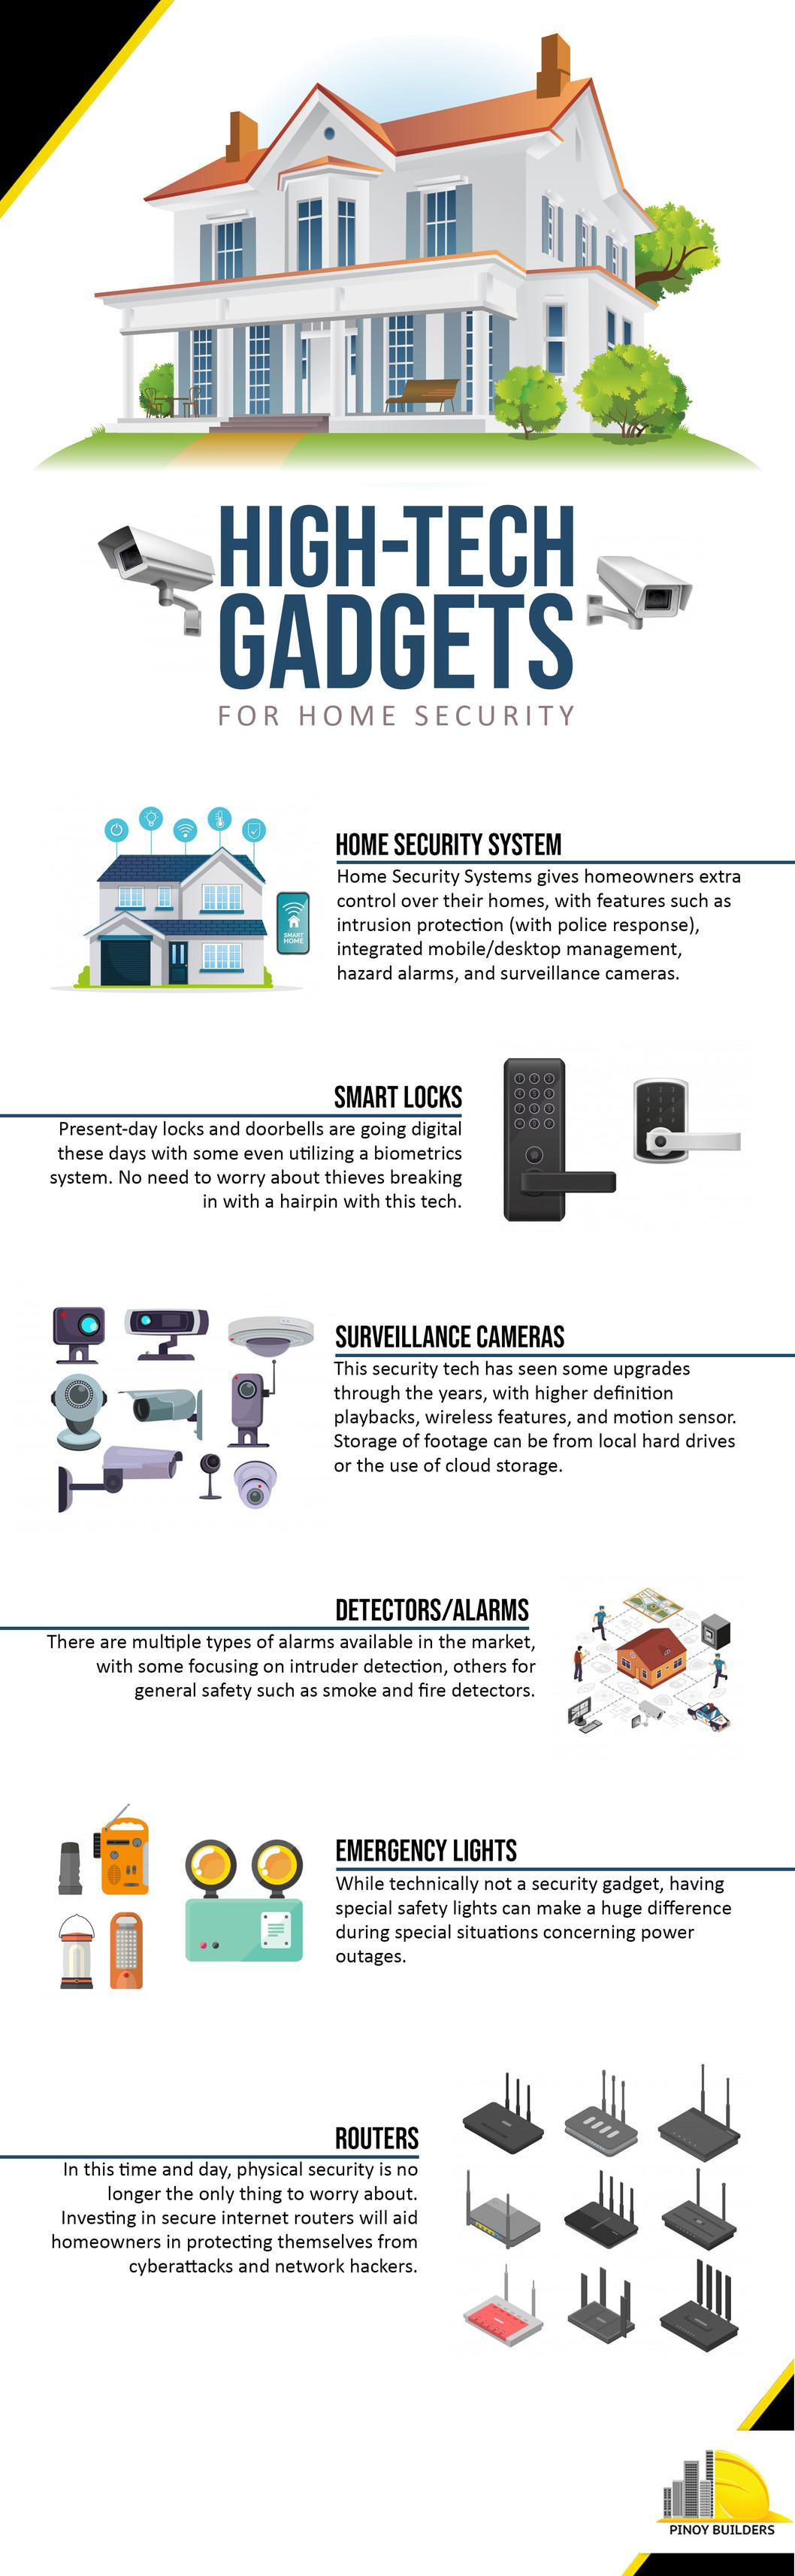 PB High-Tech Gadgets for Home Security.jpg